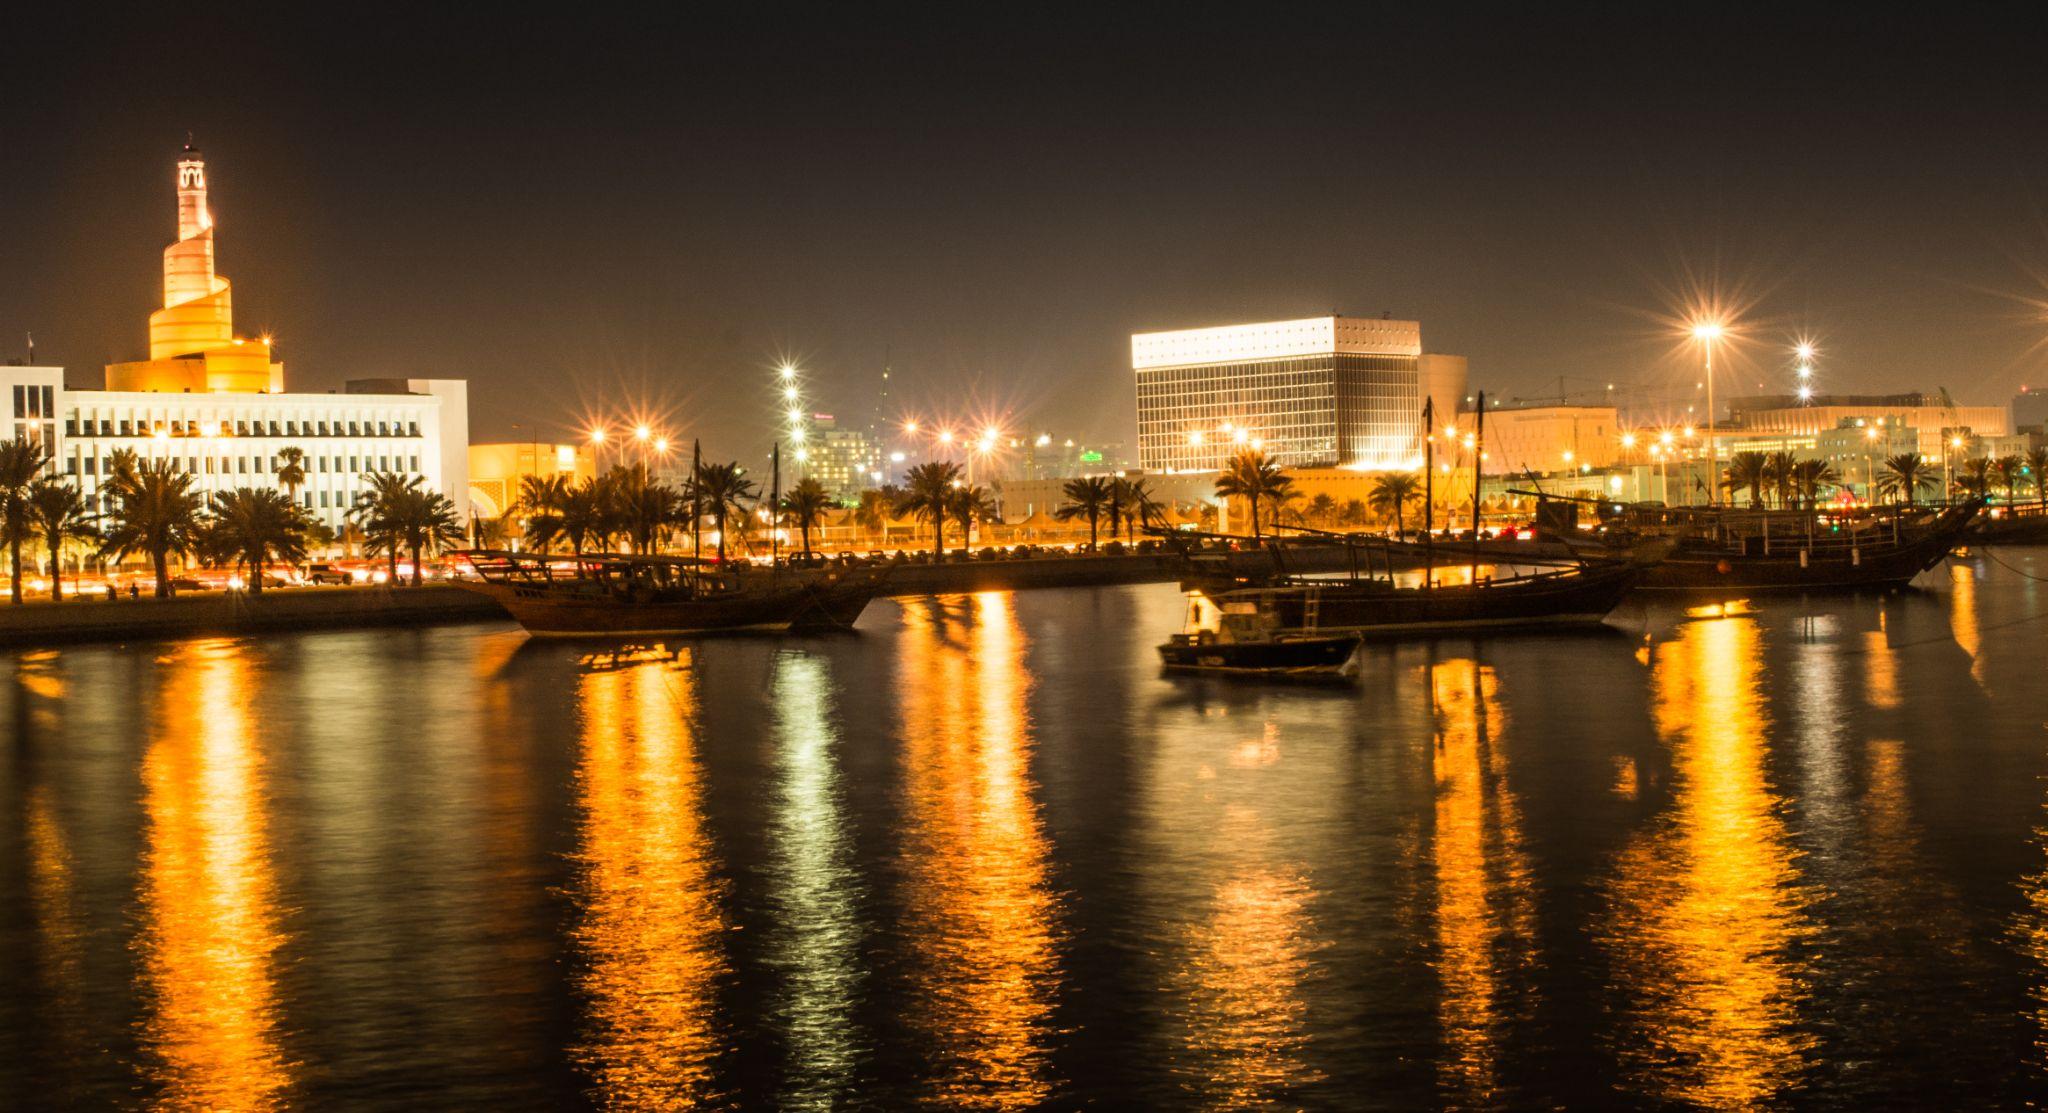 Qatar Cornish  by Sunny Bill